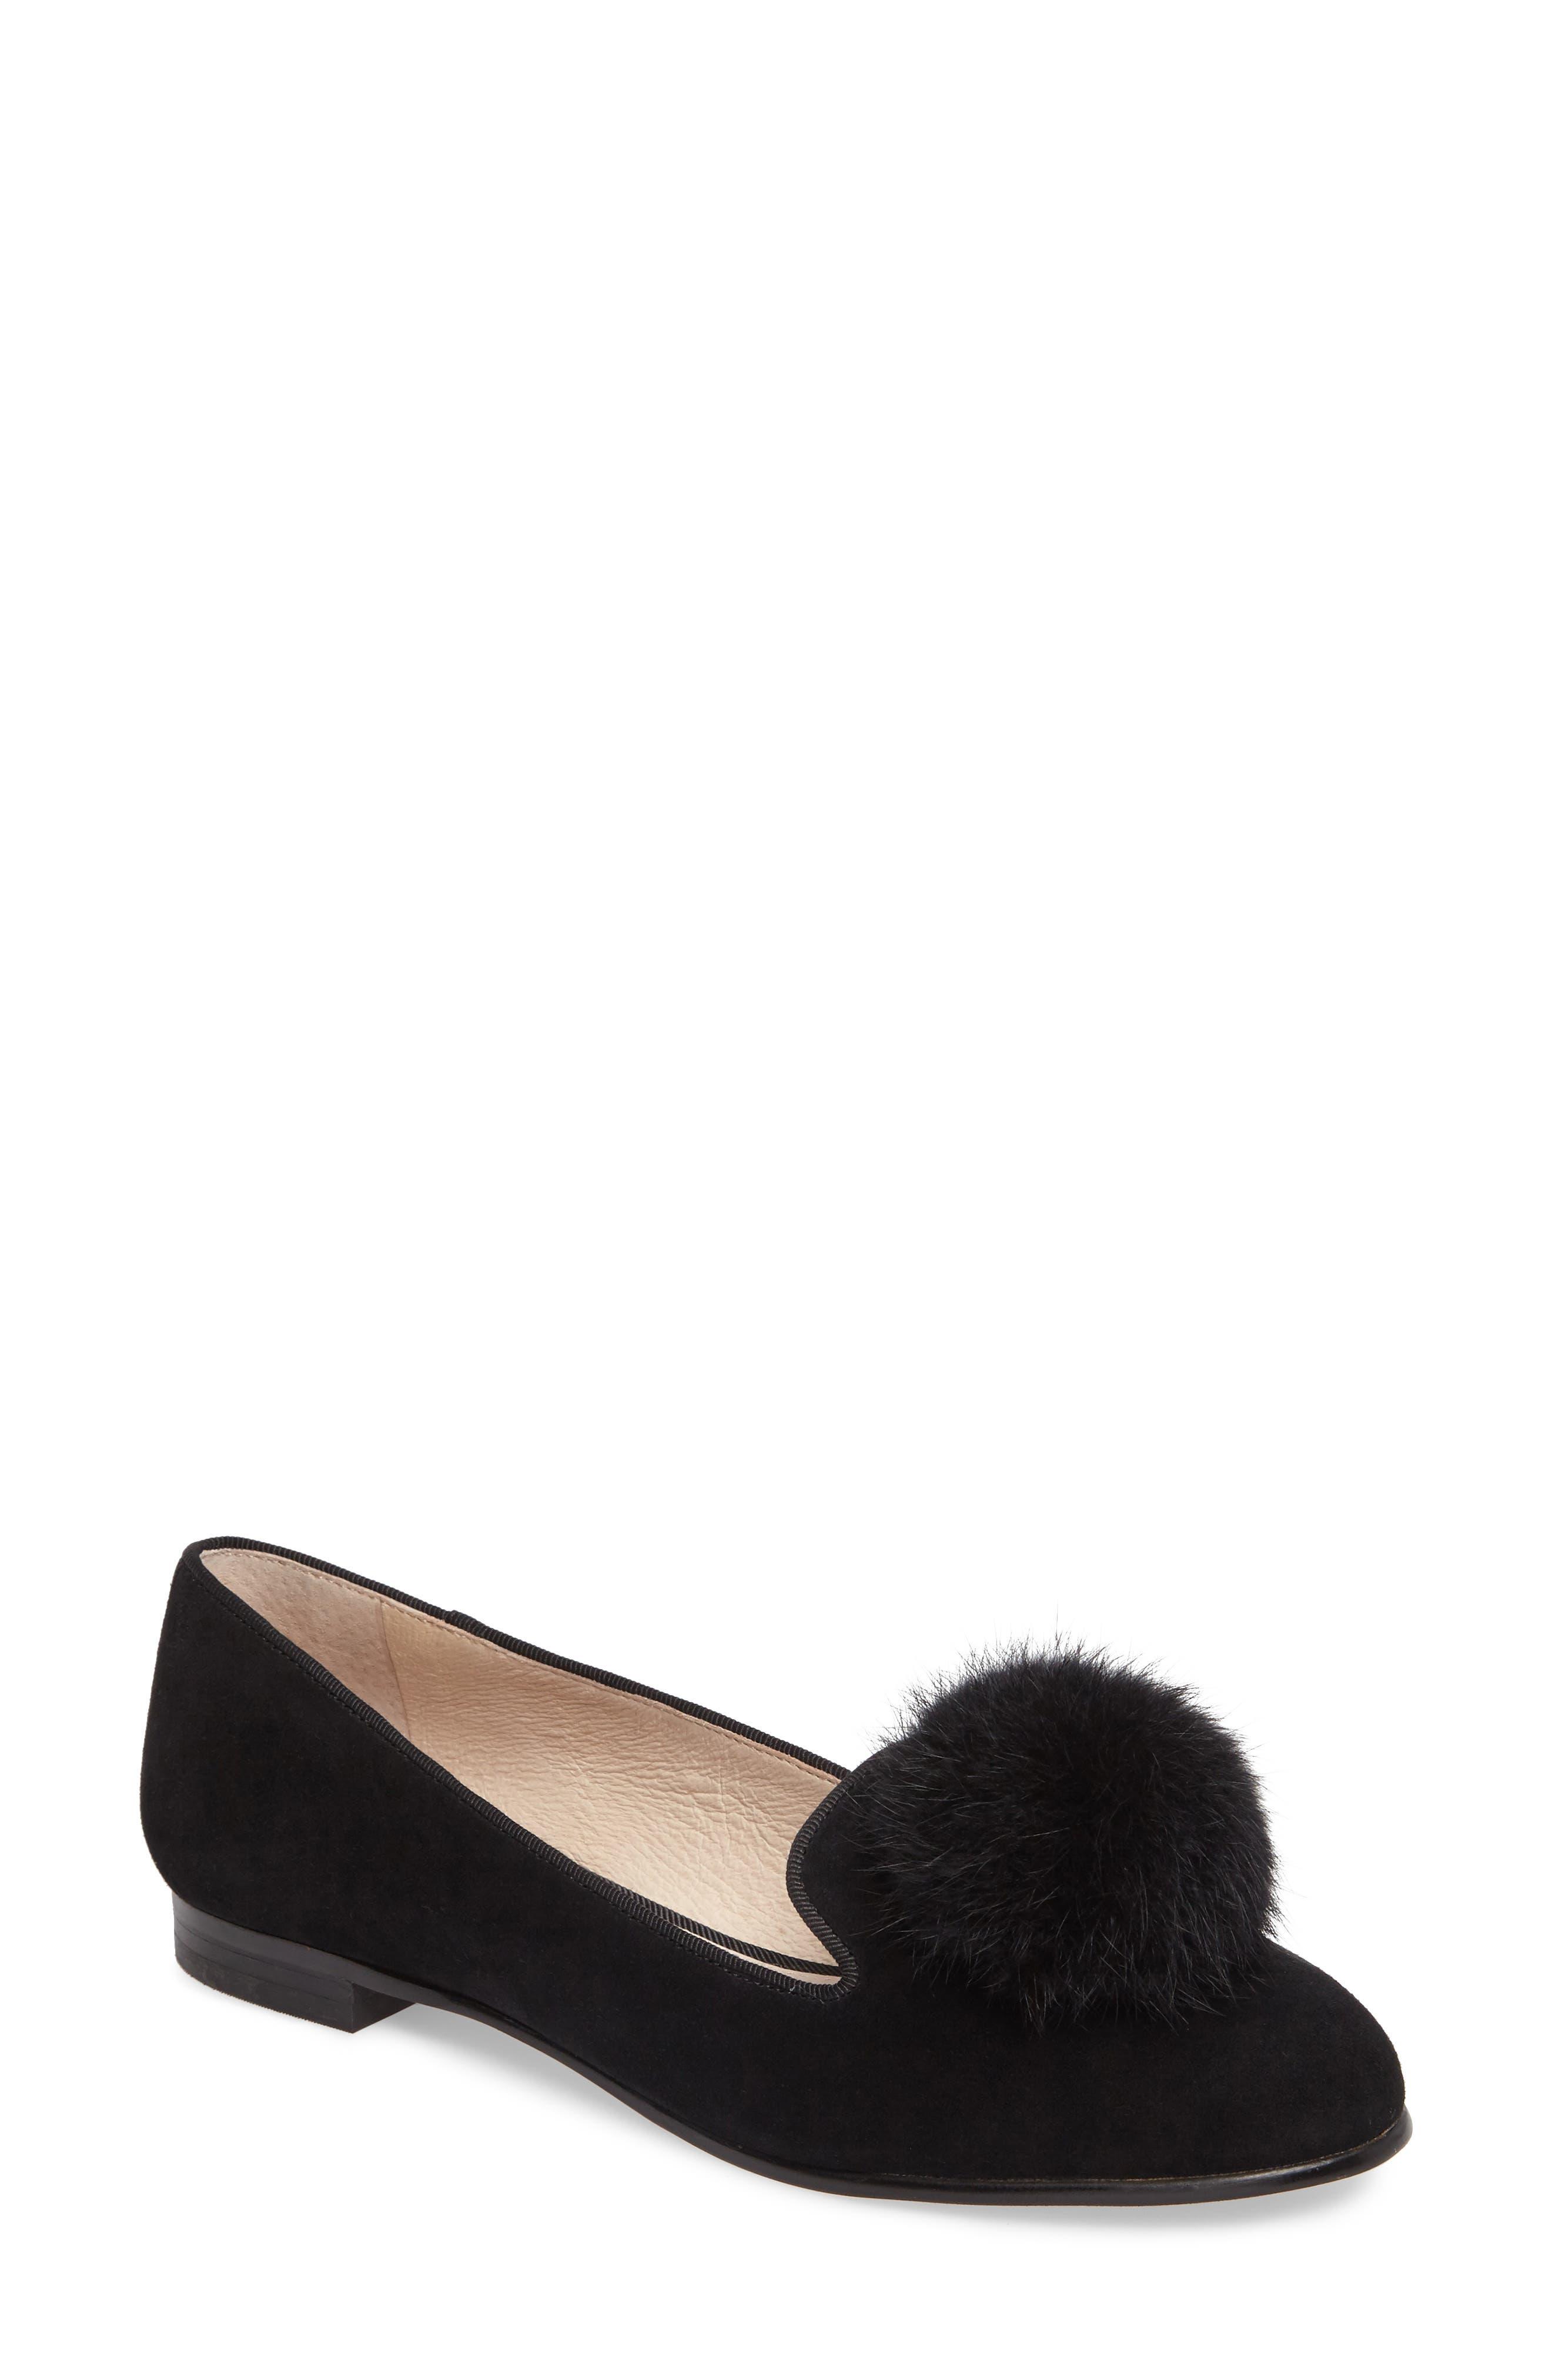 Andres Genuine Rabbit Fur Pom Loafer,                             Main thumbnail 1, color,                             BLACK SUEDE